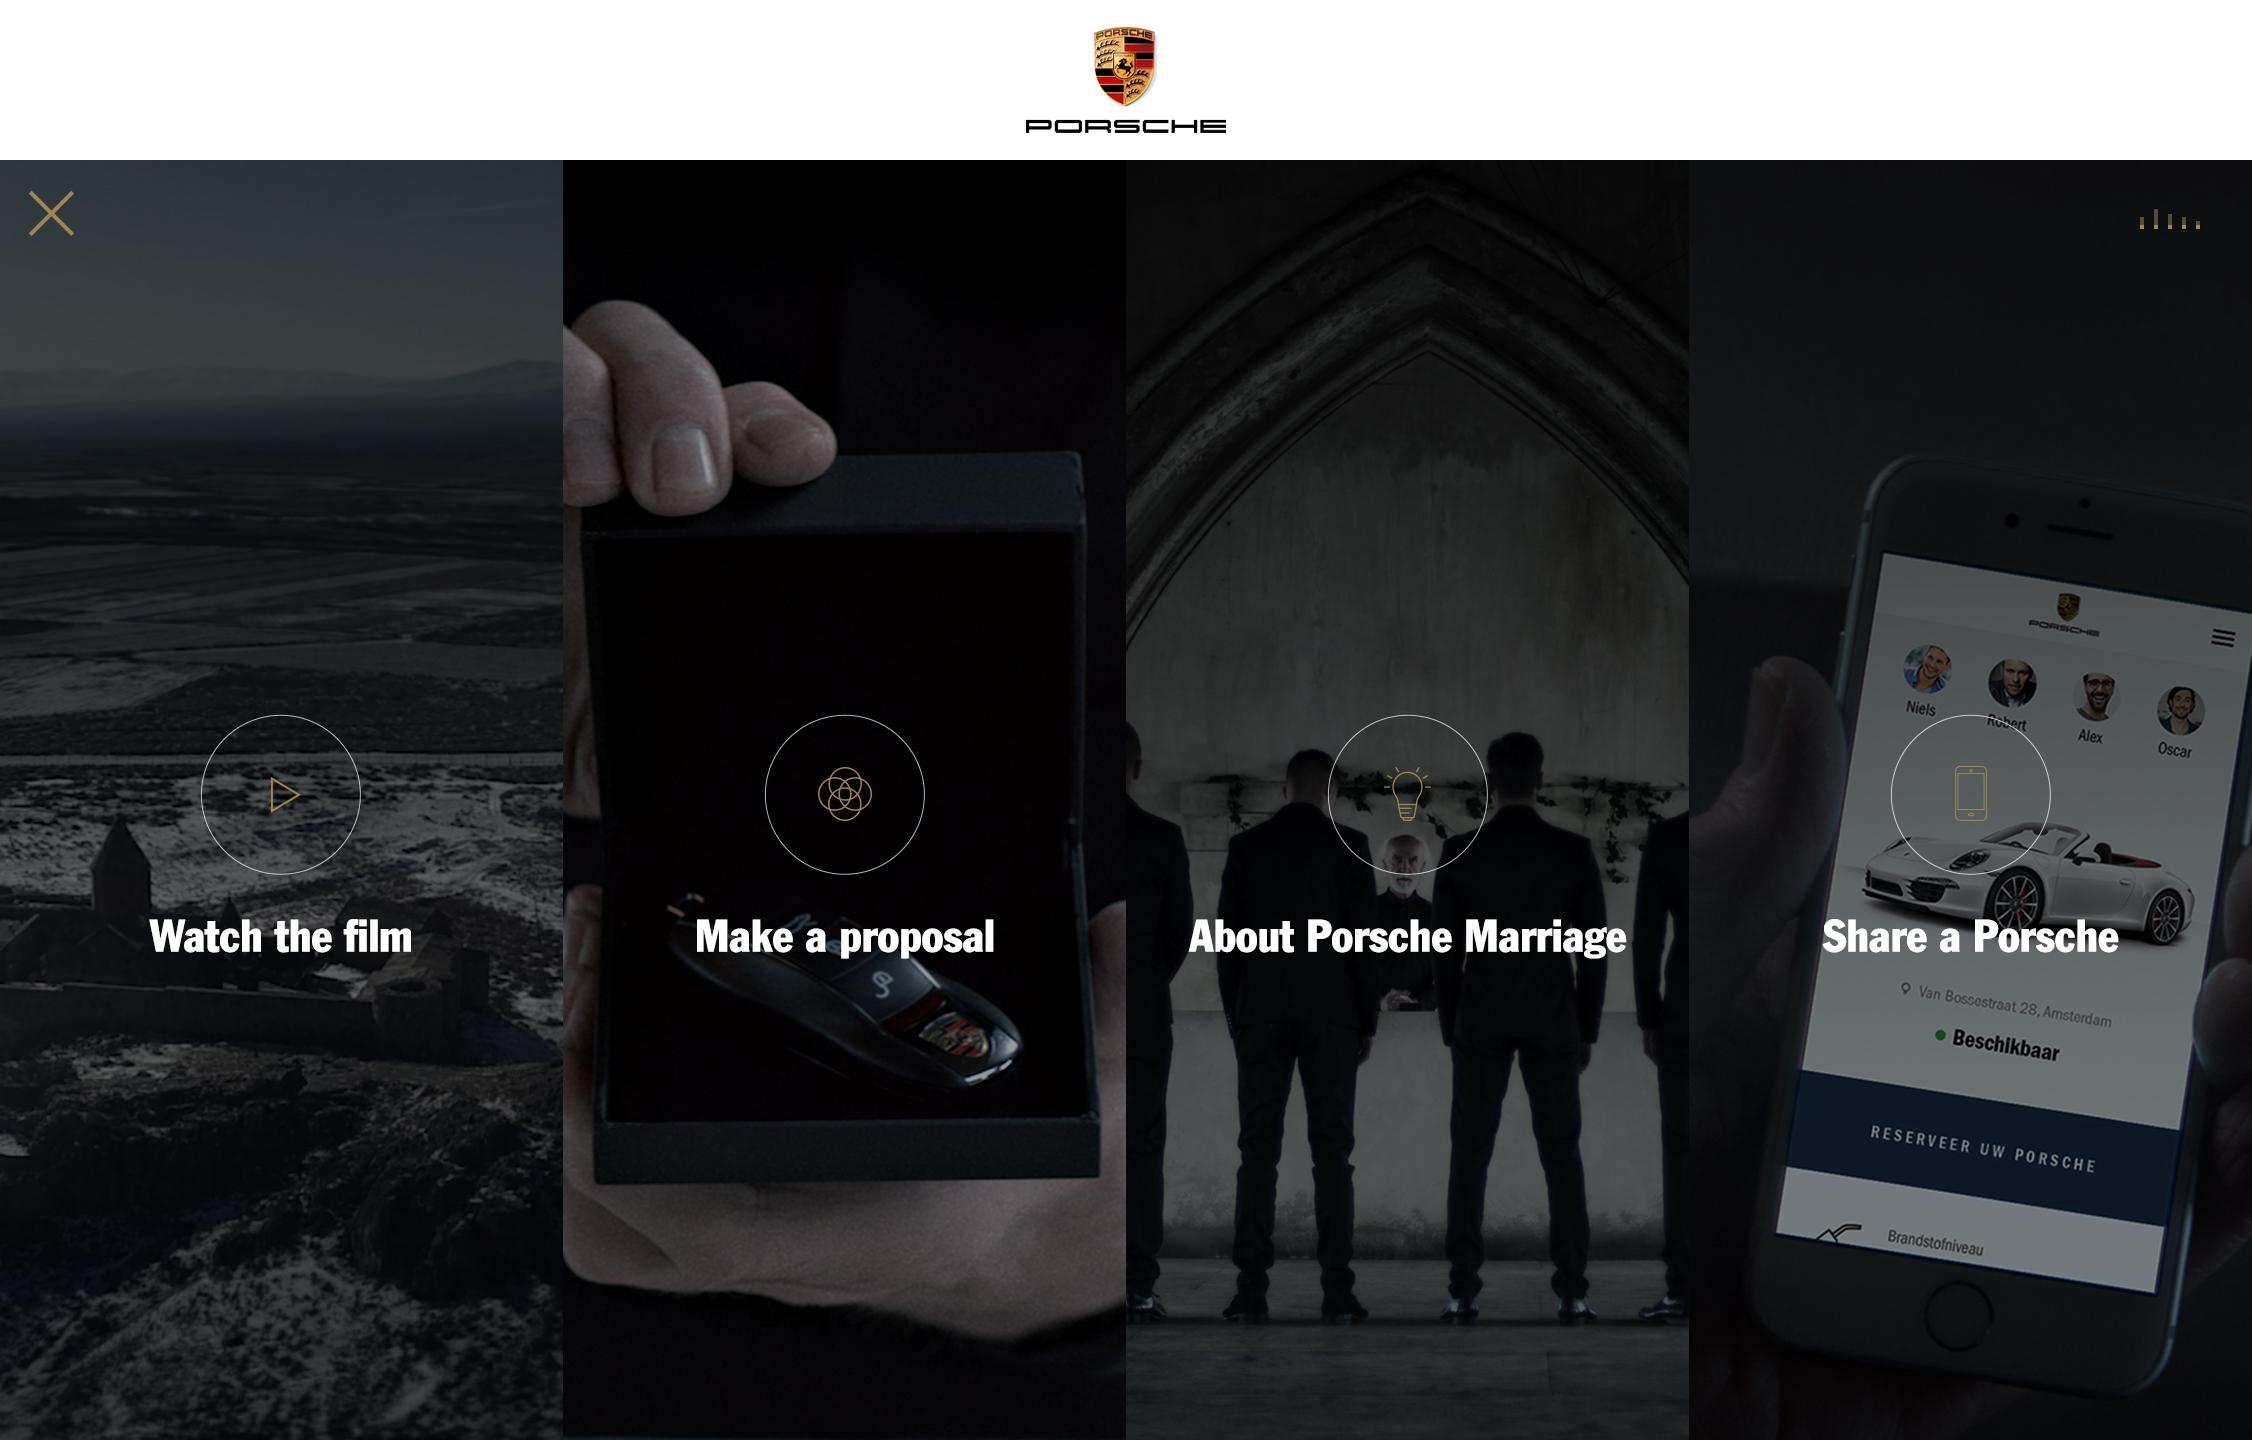 MJP-–-Porsche-Marriage-–-Menu